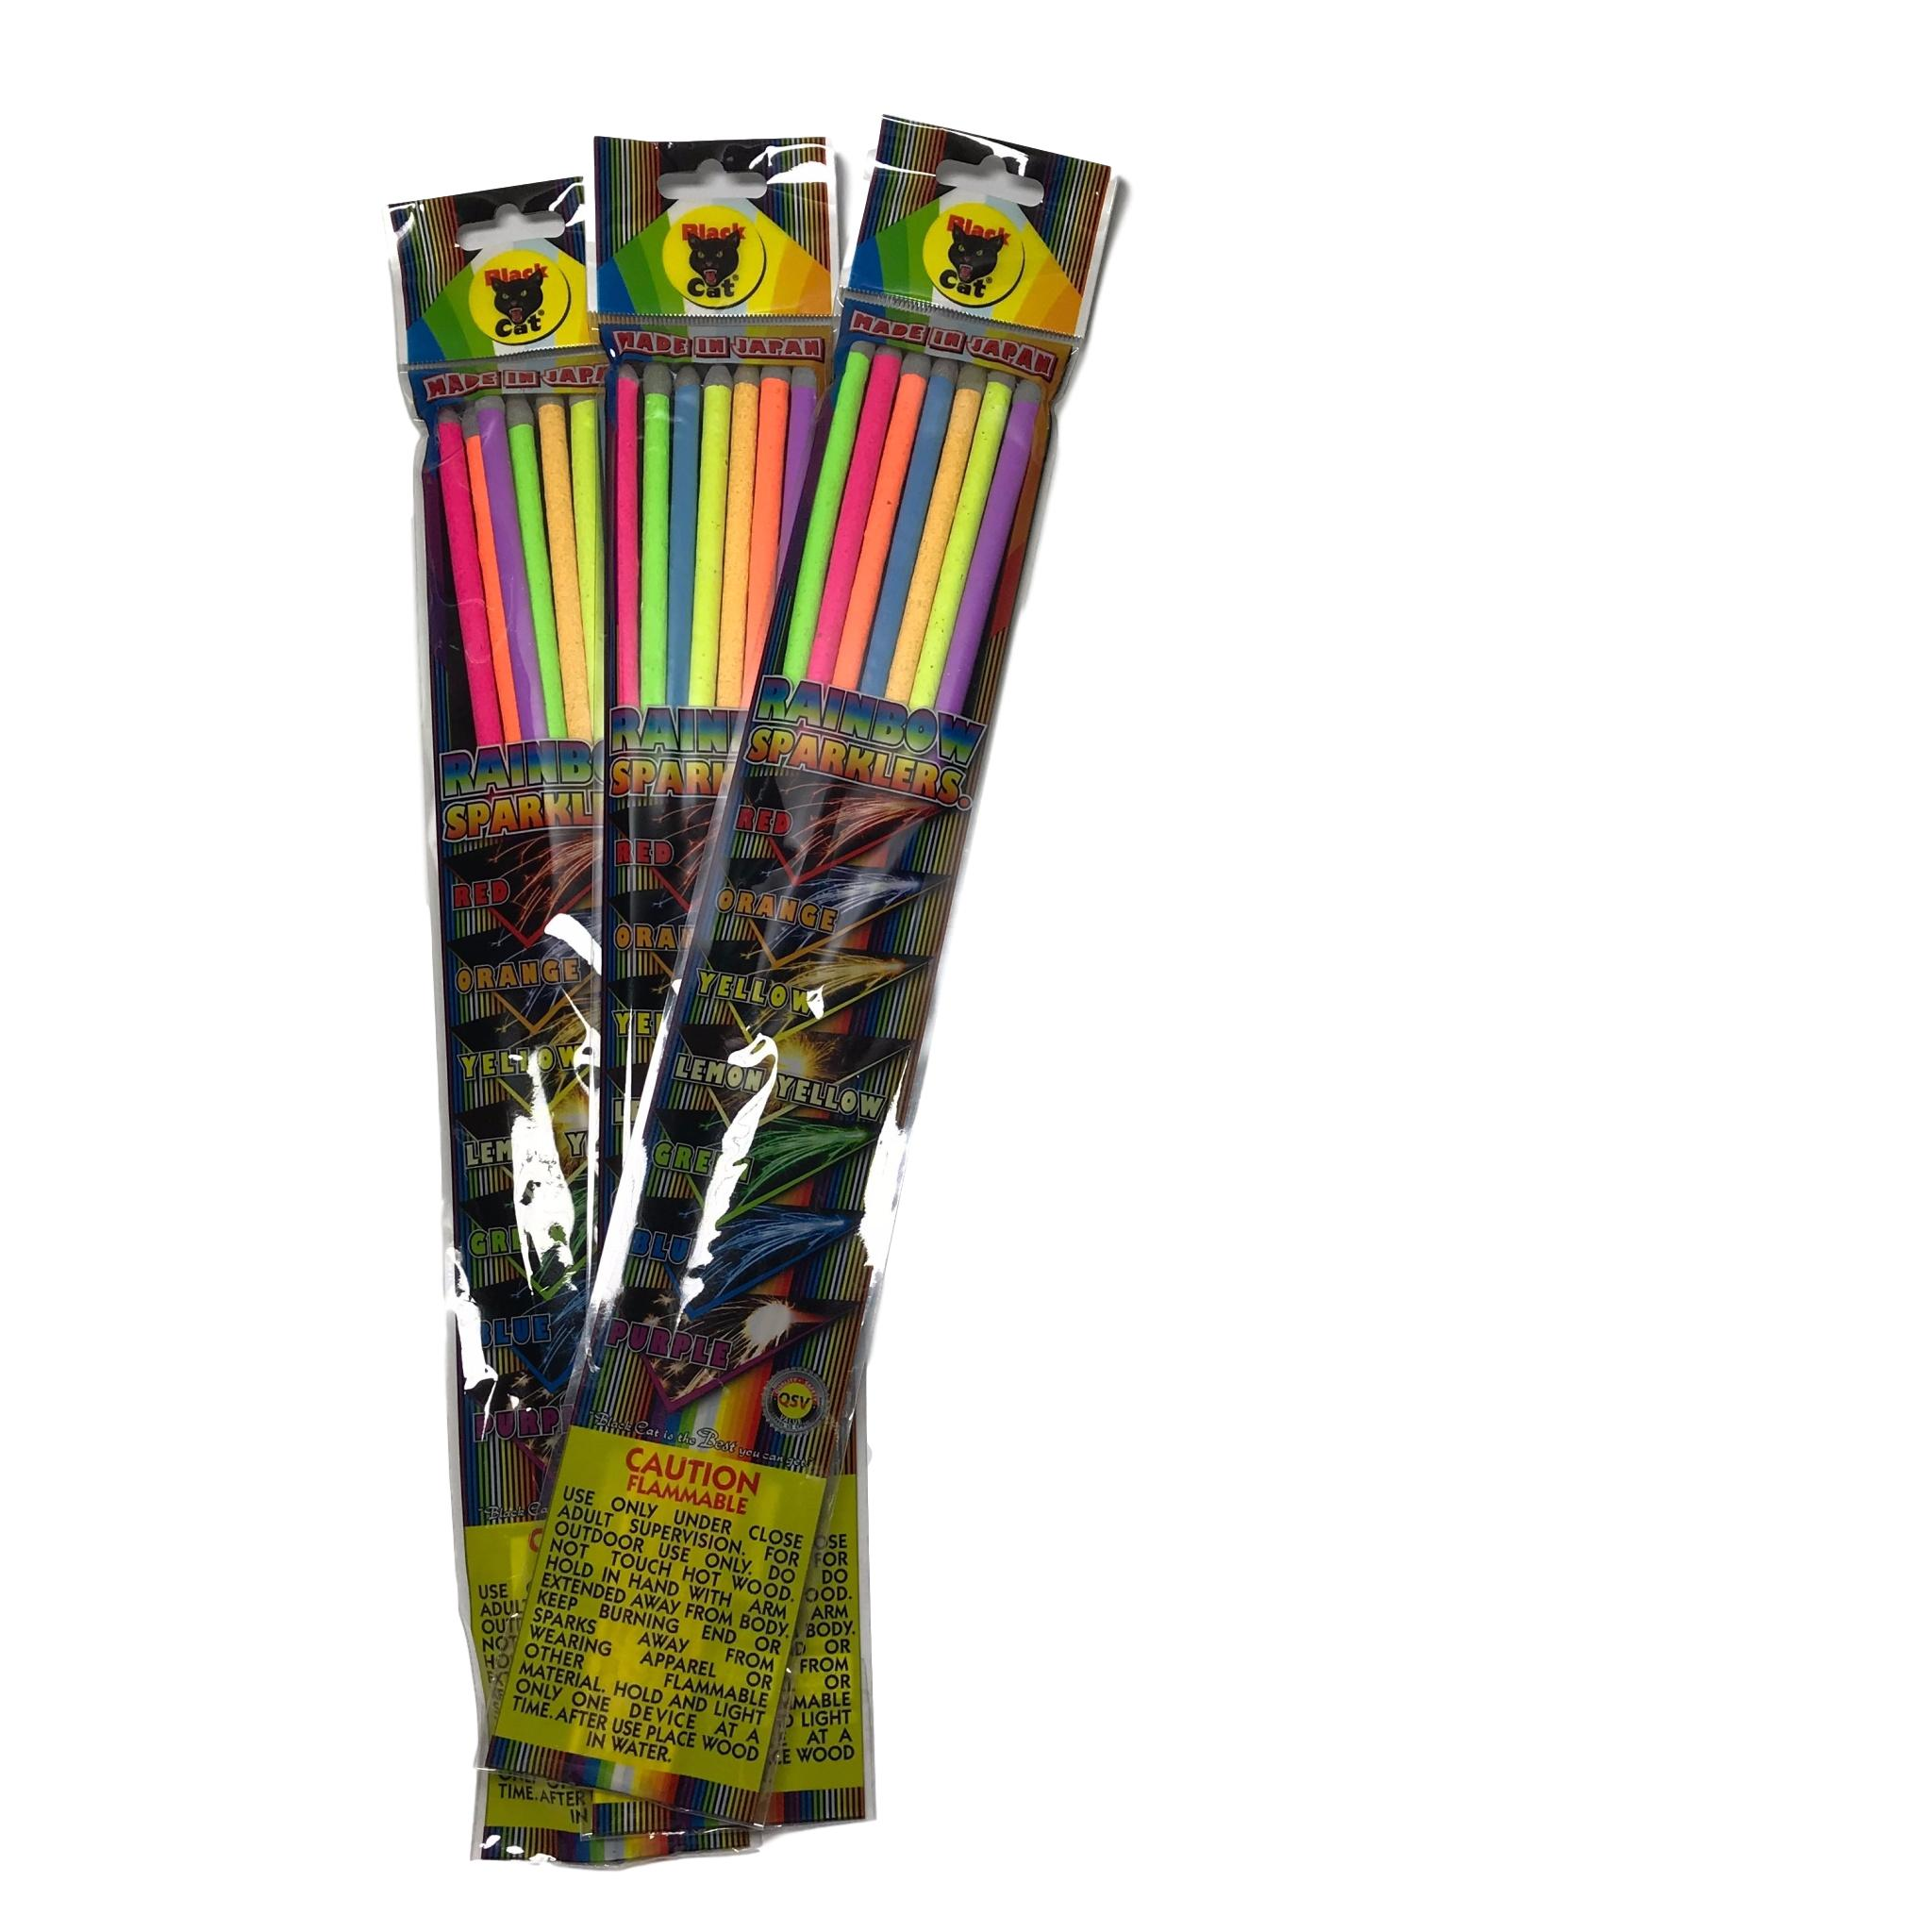 14 Inch Black Cat Neon Sparklers, 72 Pack | Wedding Sparklers USA